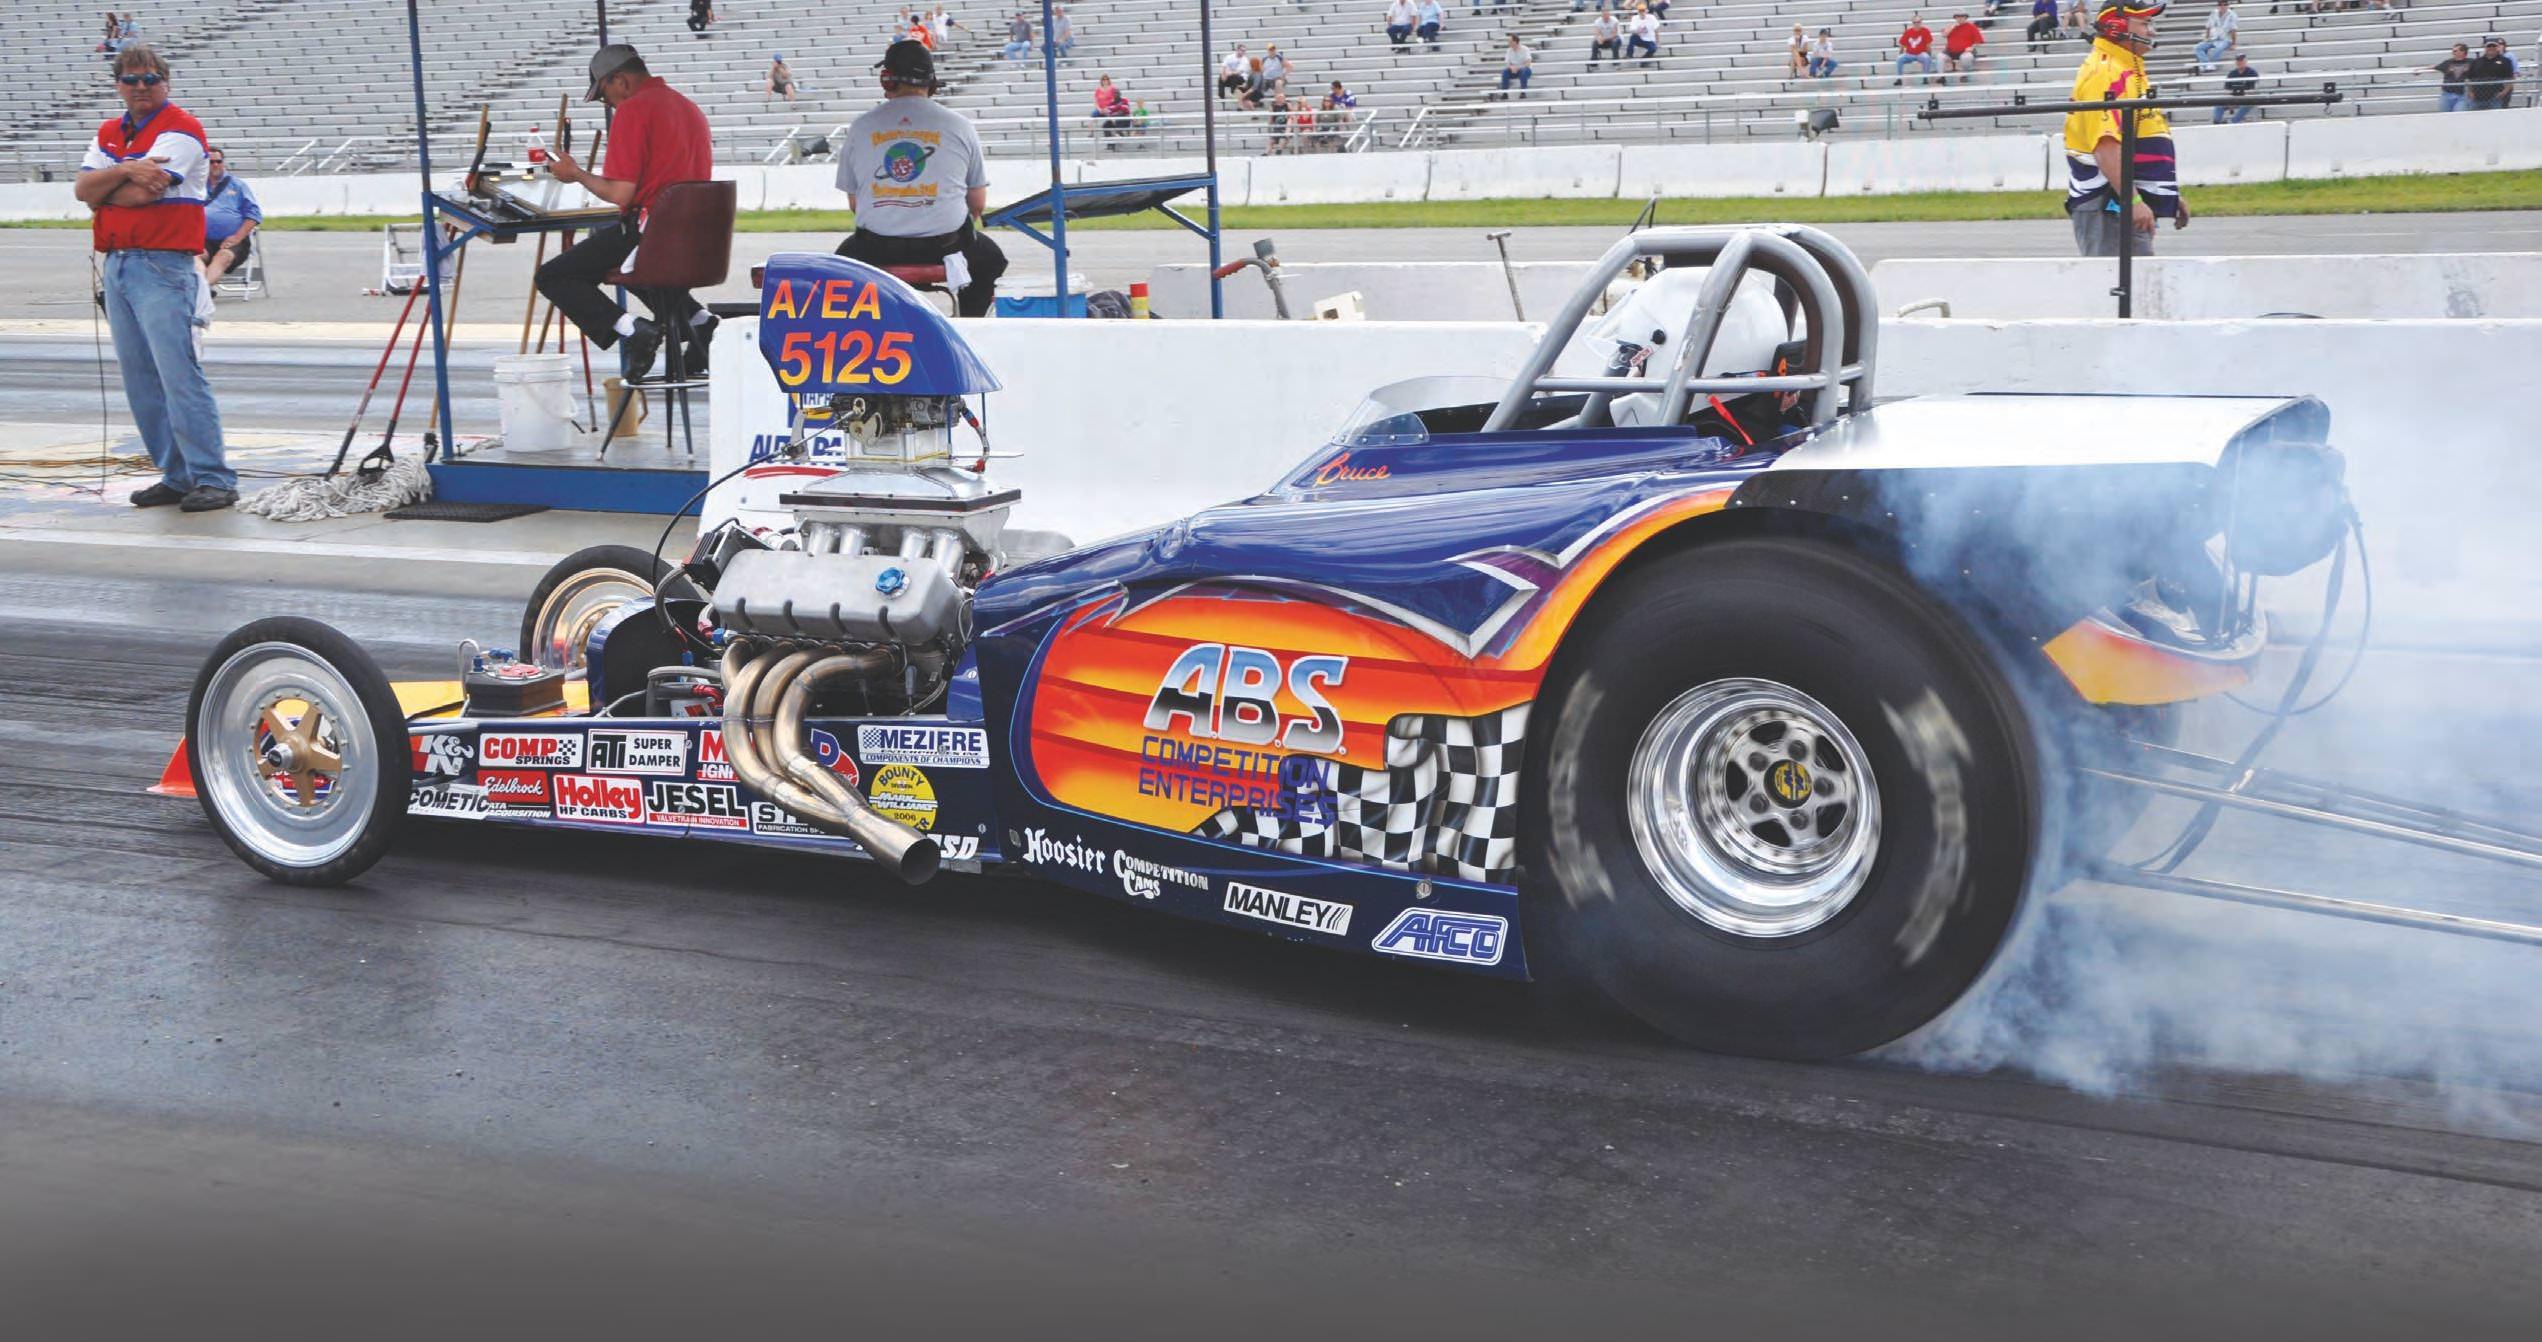 Hoosier: Racing Globally